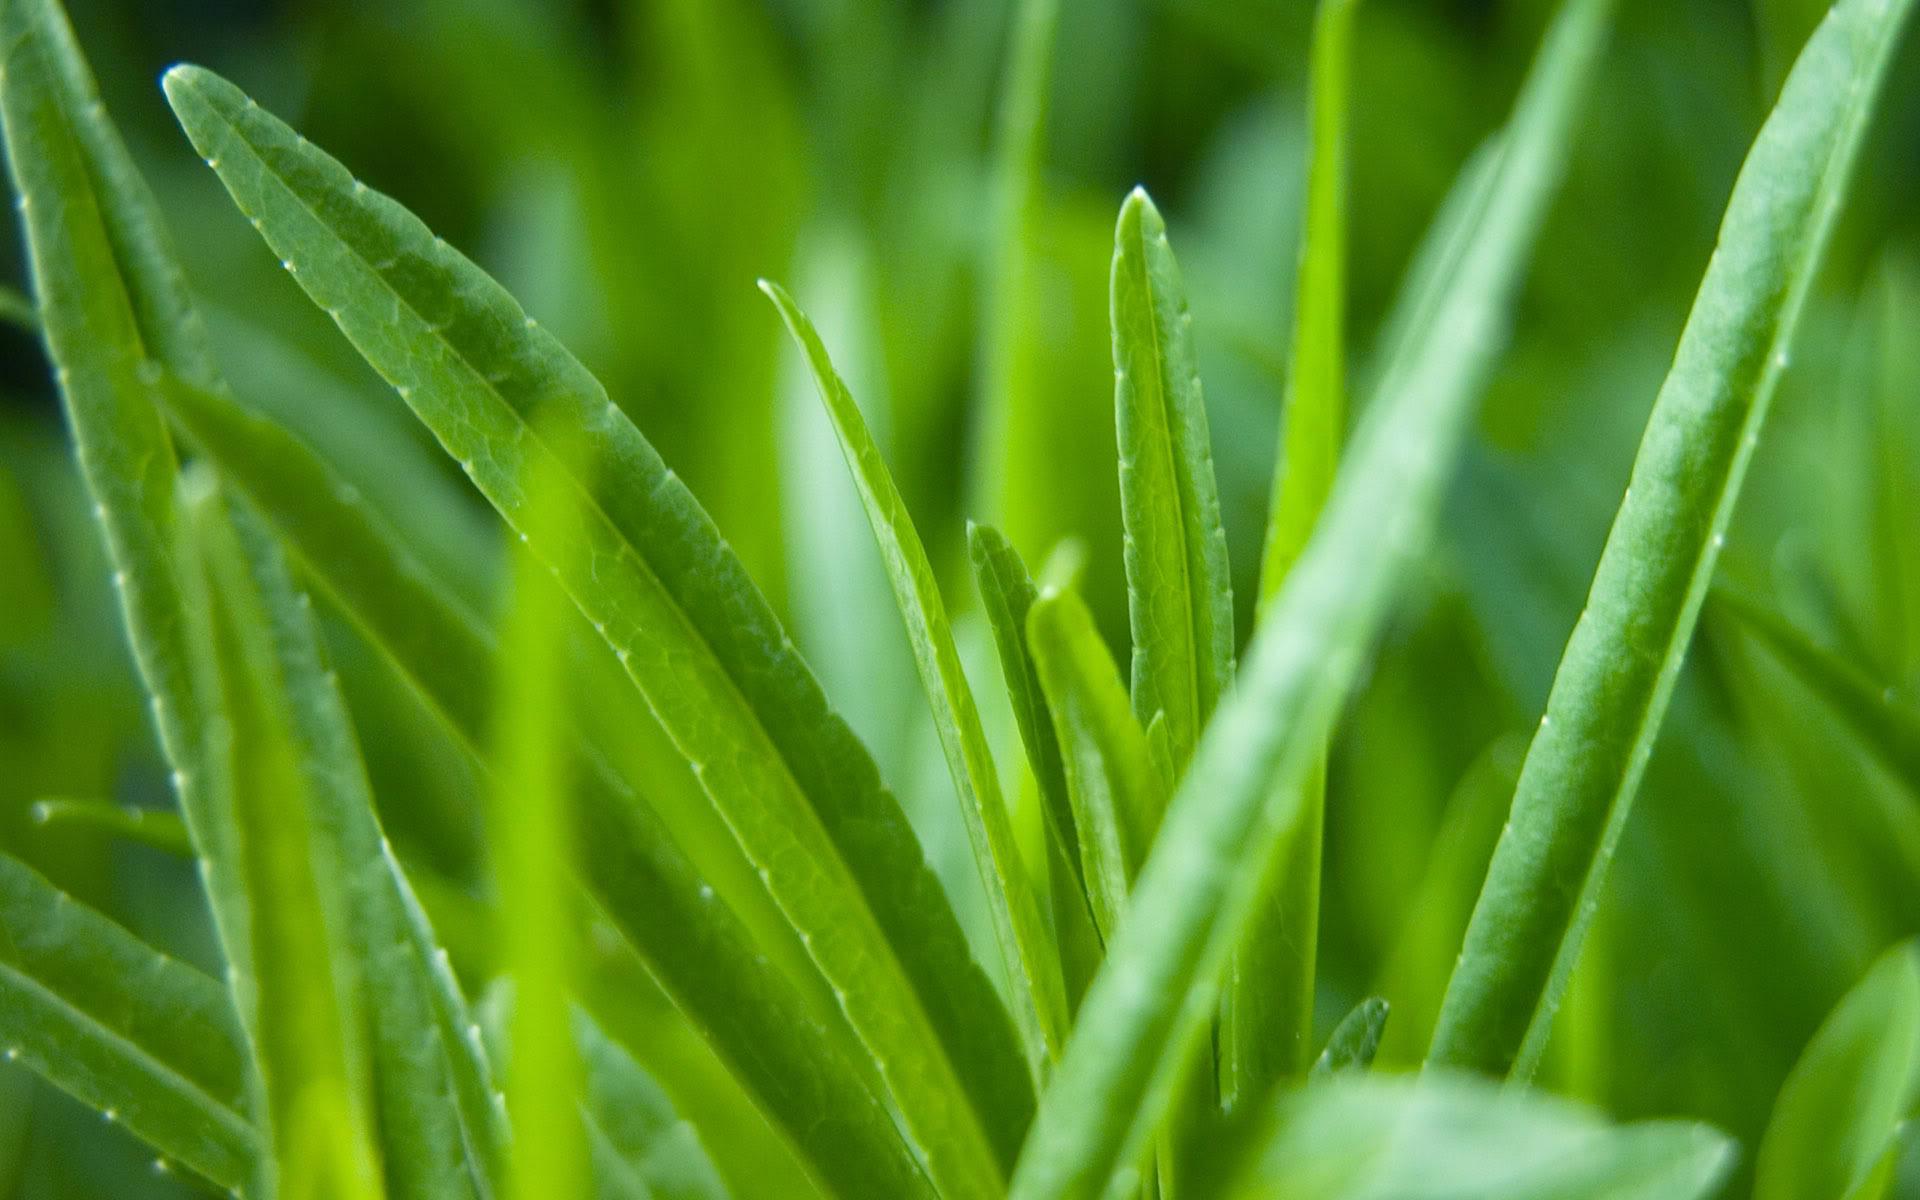 hd grass background 18872